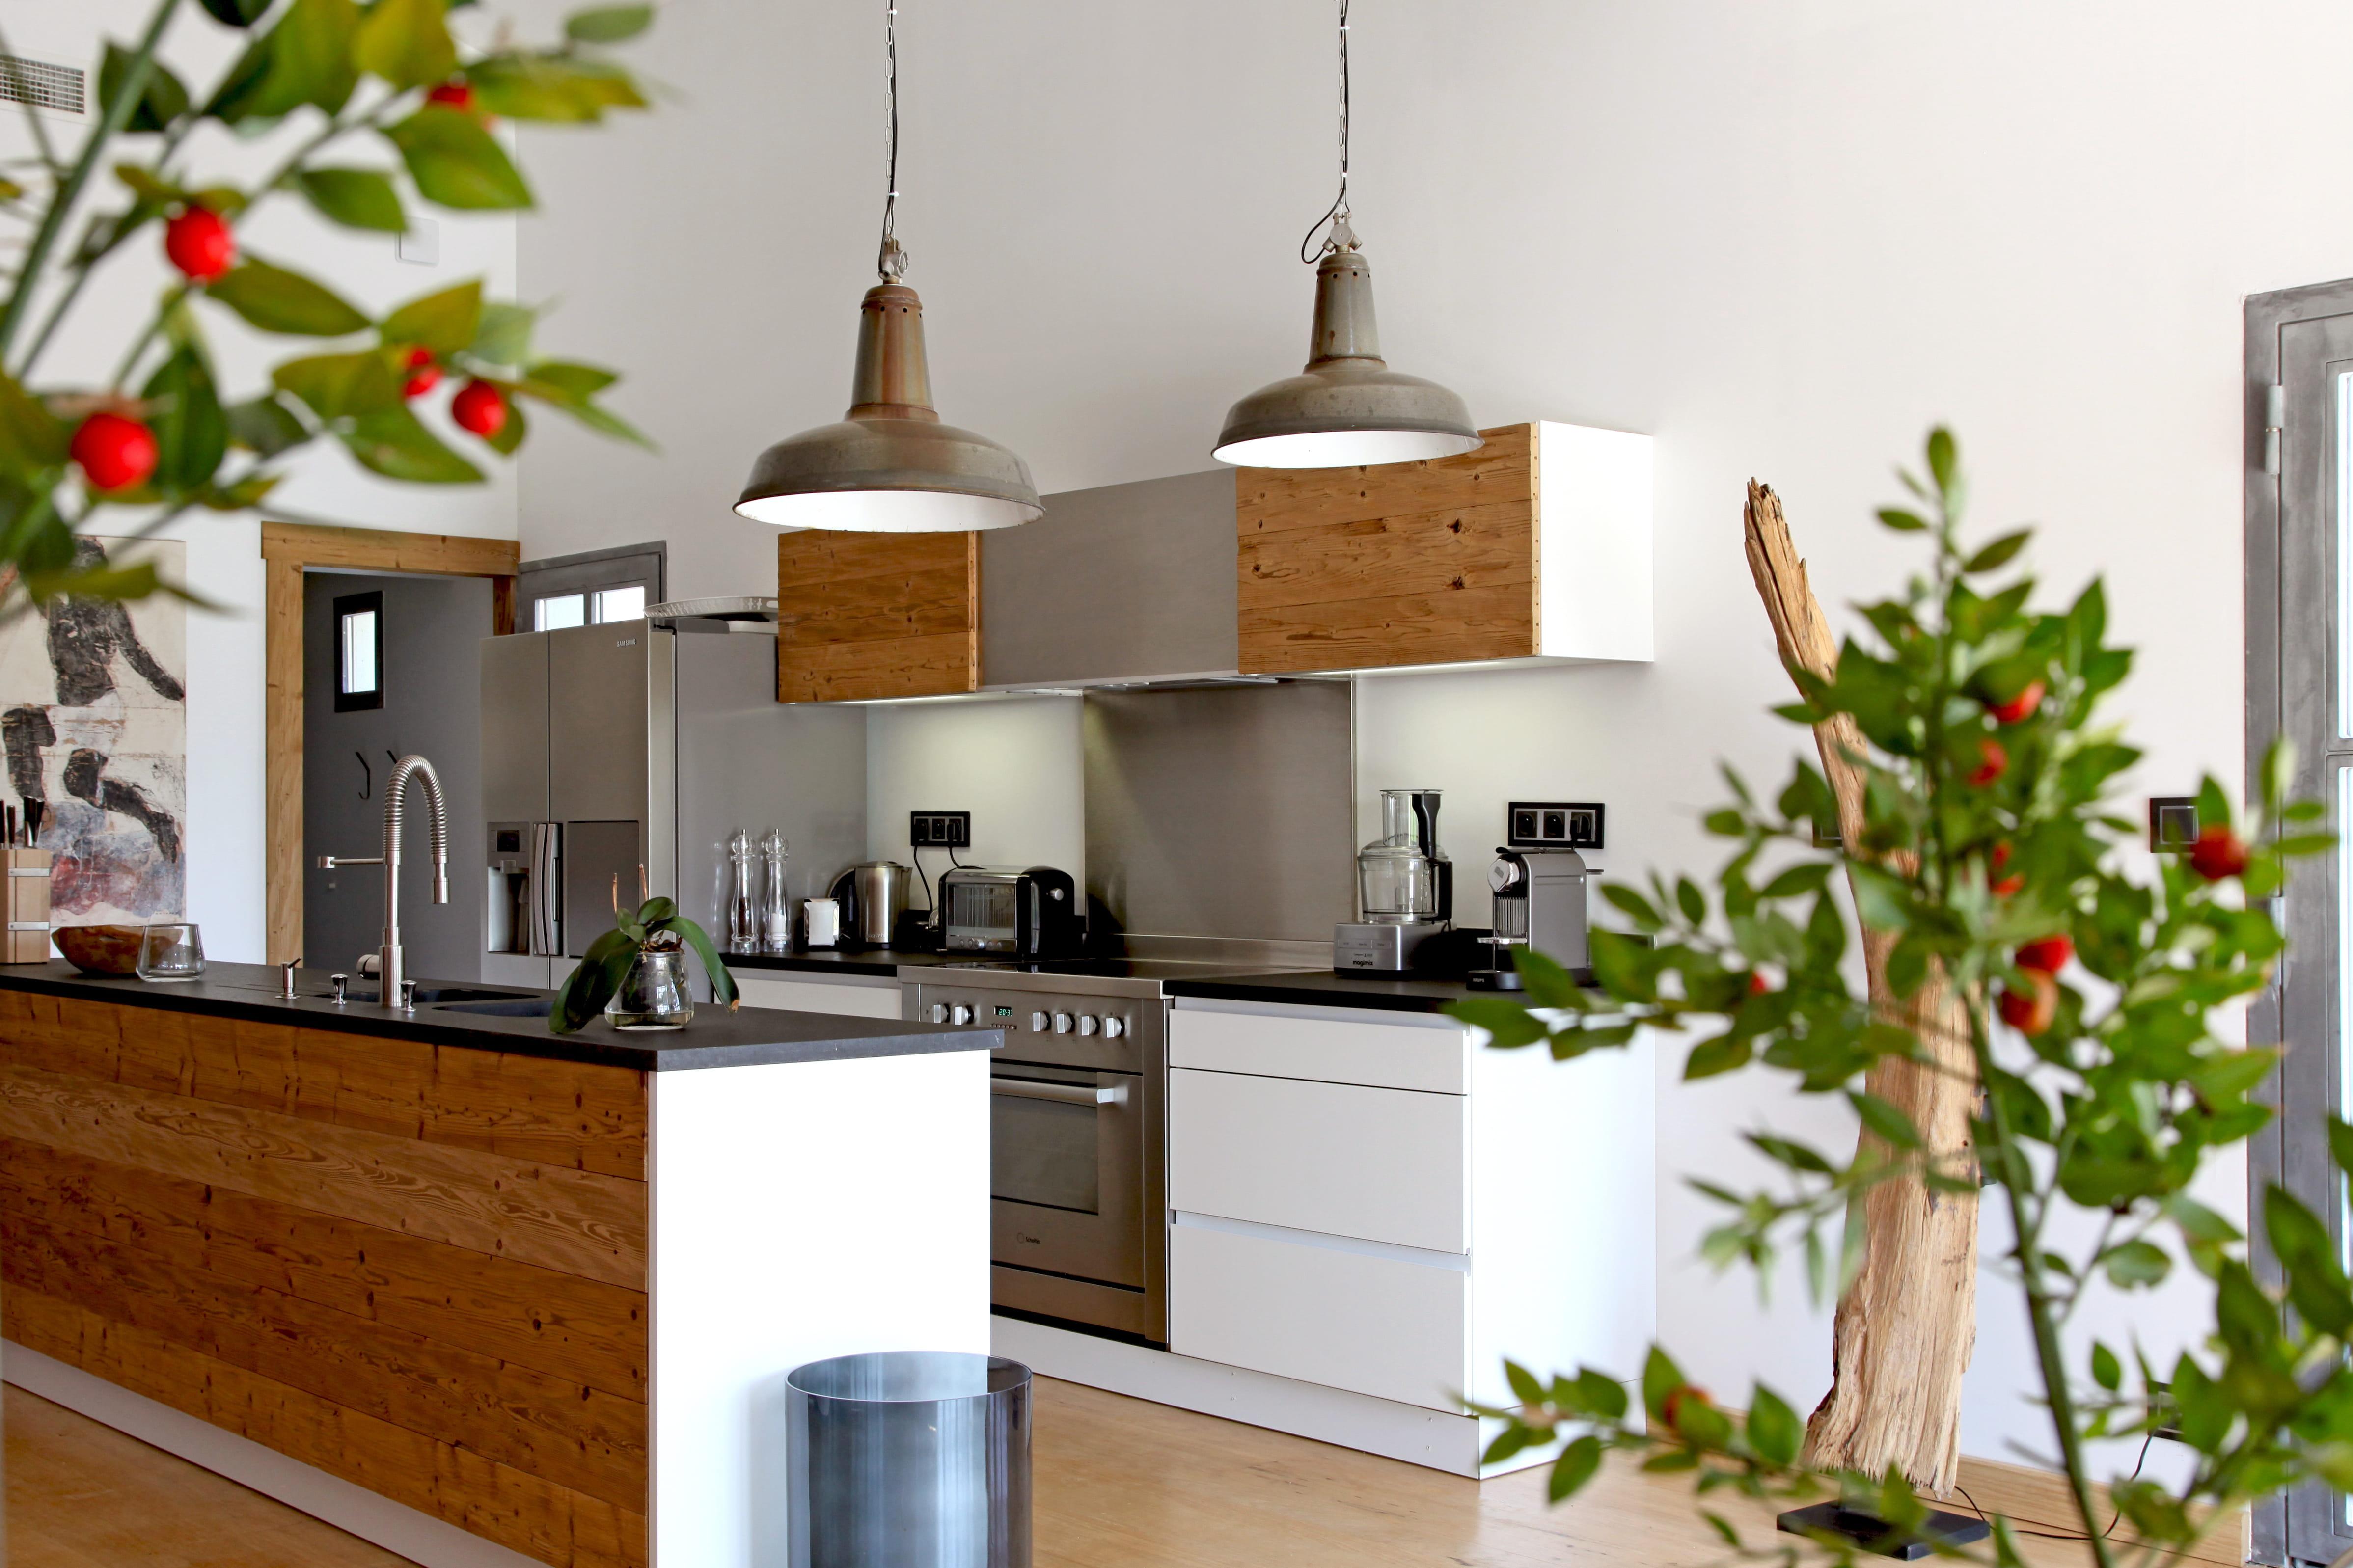 Relooker une cuisine rustique pictures to pin on pinterest - Comment relooker une cuisine ...